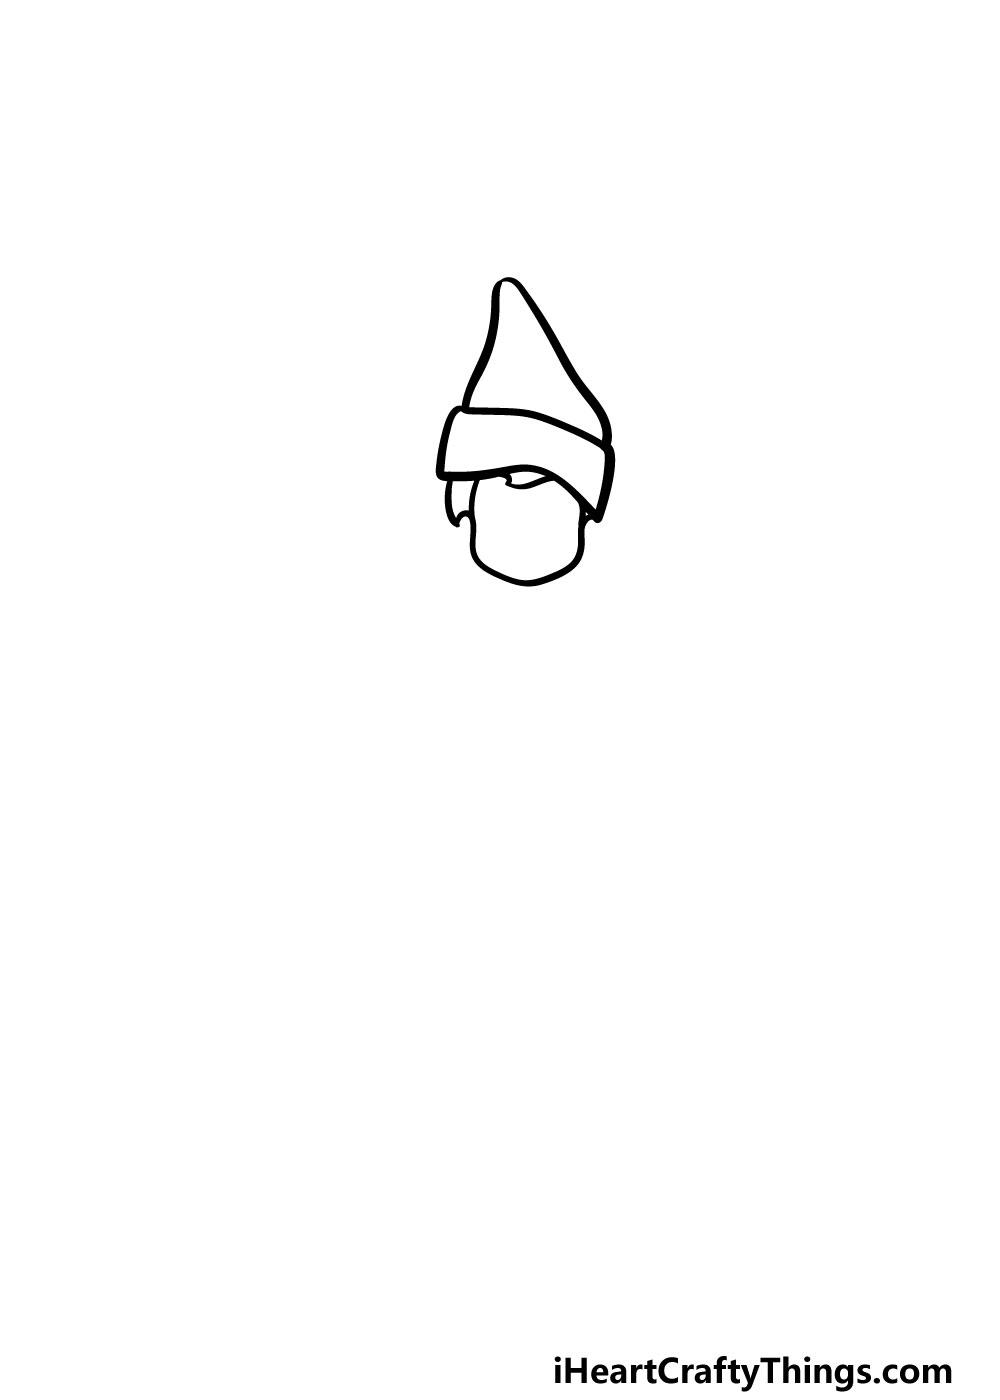 drawing an elf on a shelf step 1